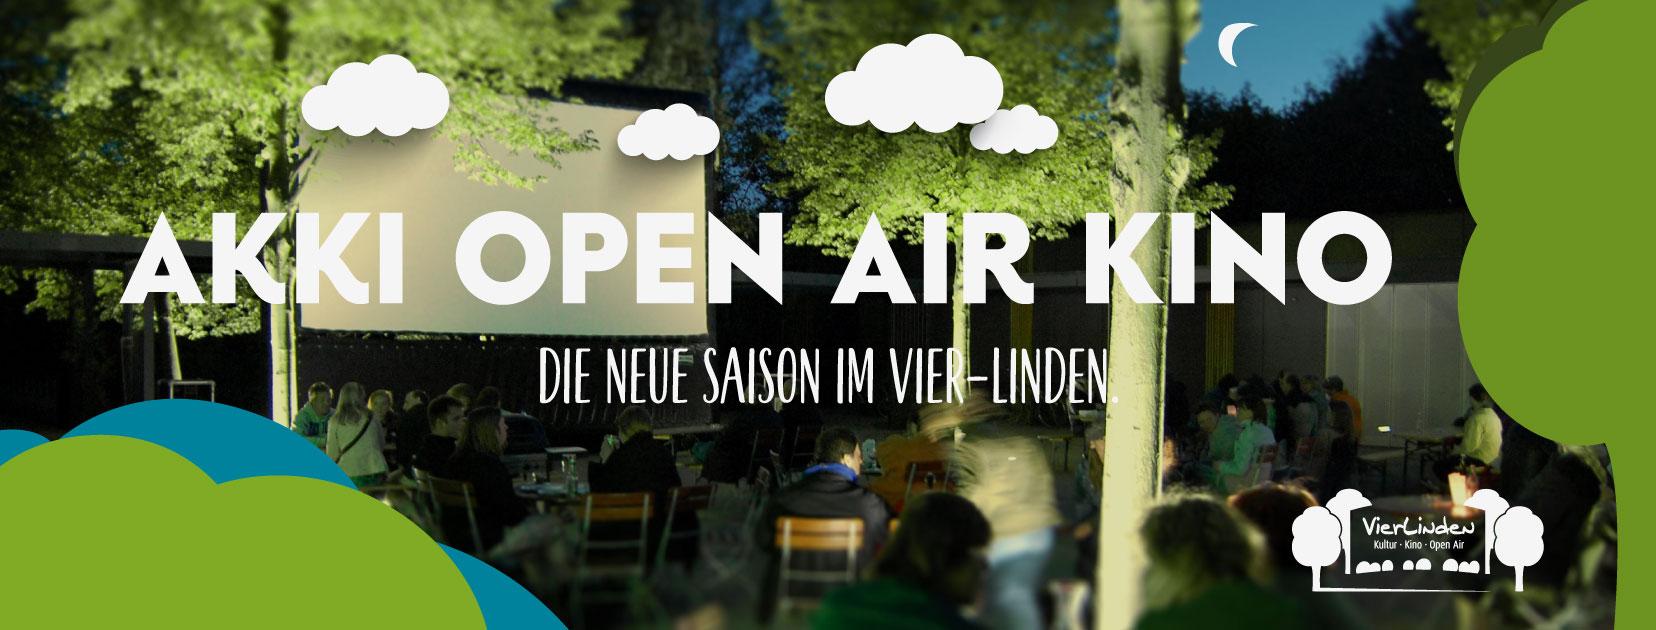 Vier-Linden Open-Air Kino Banner